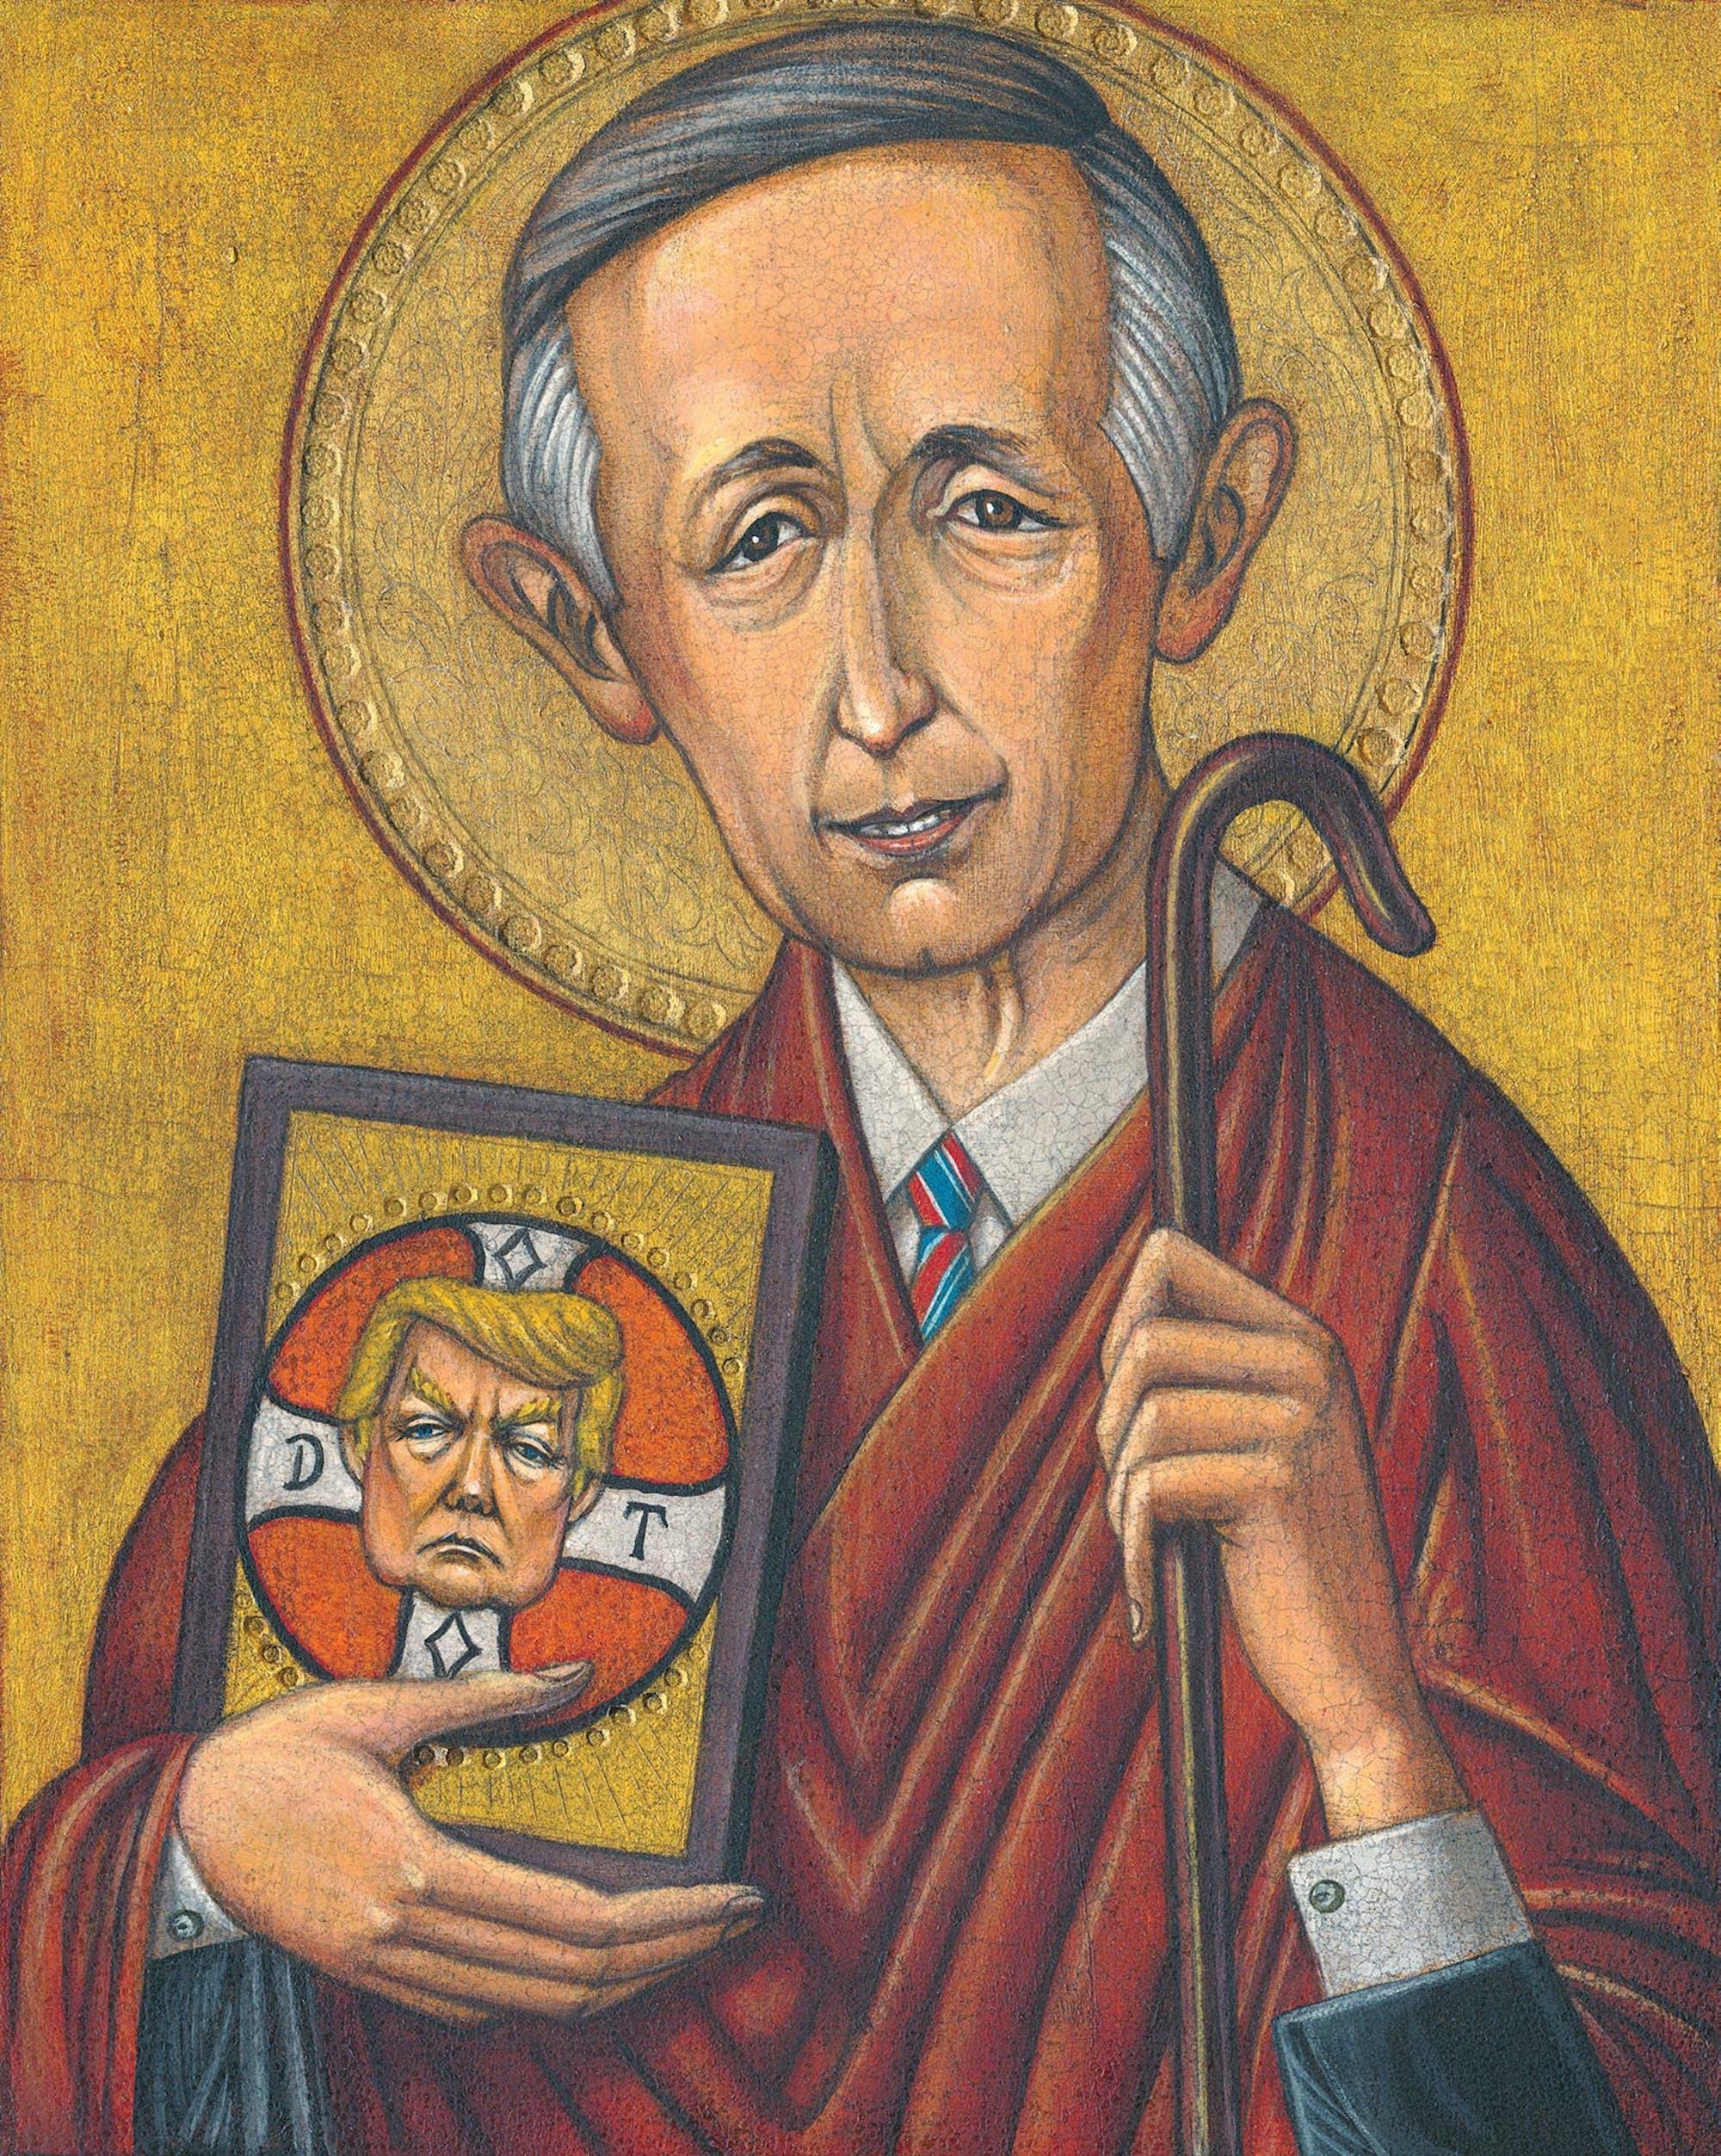 Illustration of Robert Jeffress